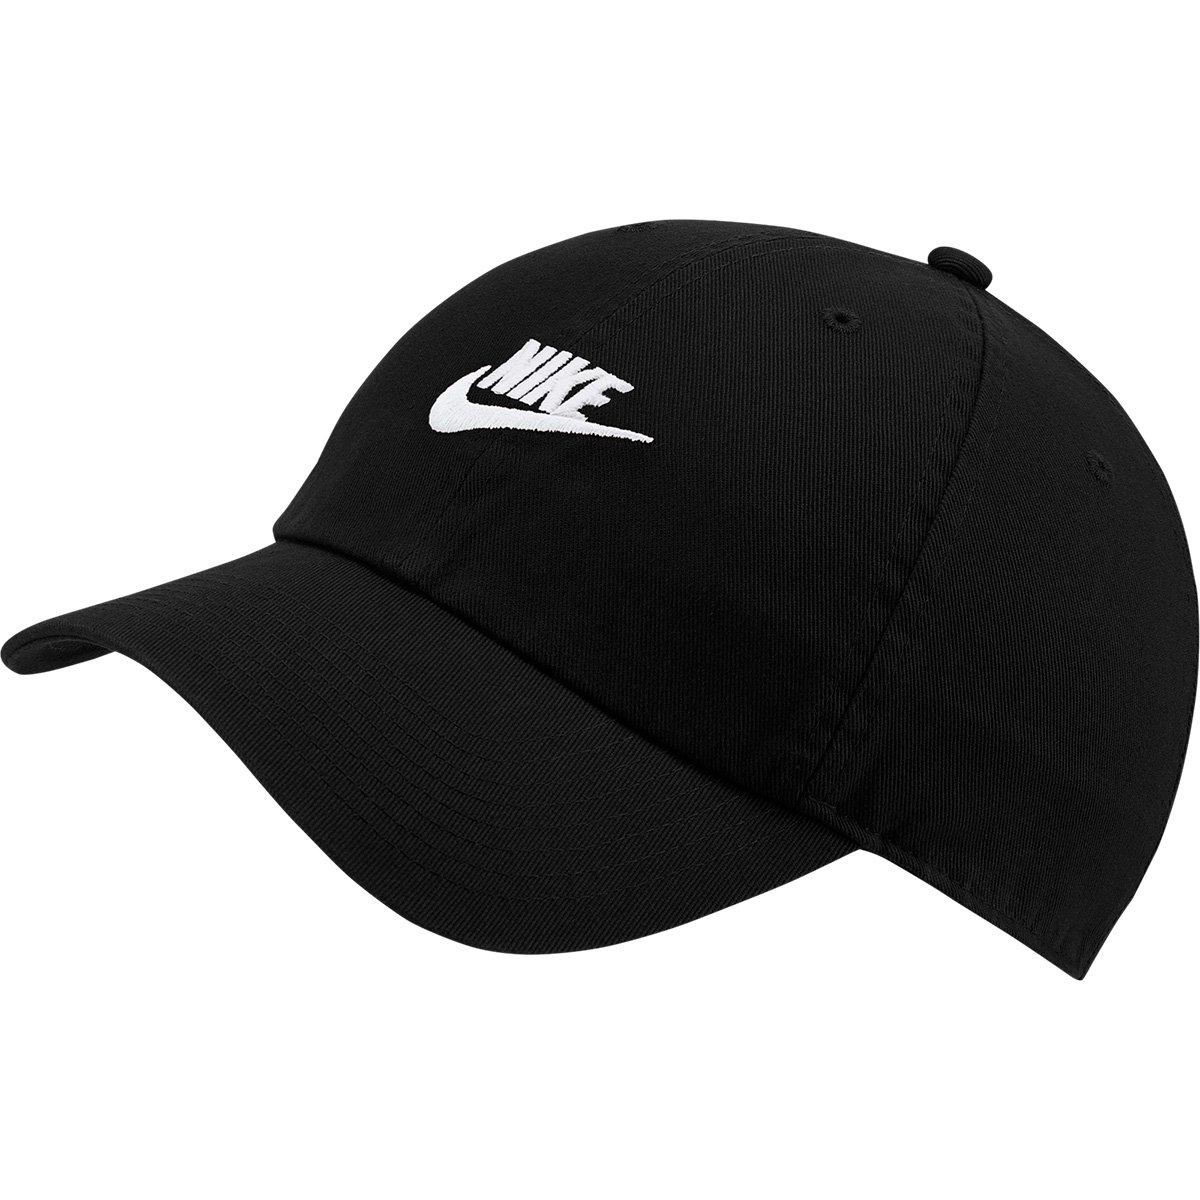 17df6b7447 Boné Nike Aba Curva U Nsw H86 Futura Washed - Preto e Branco